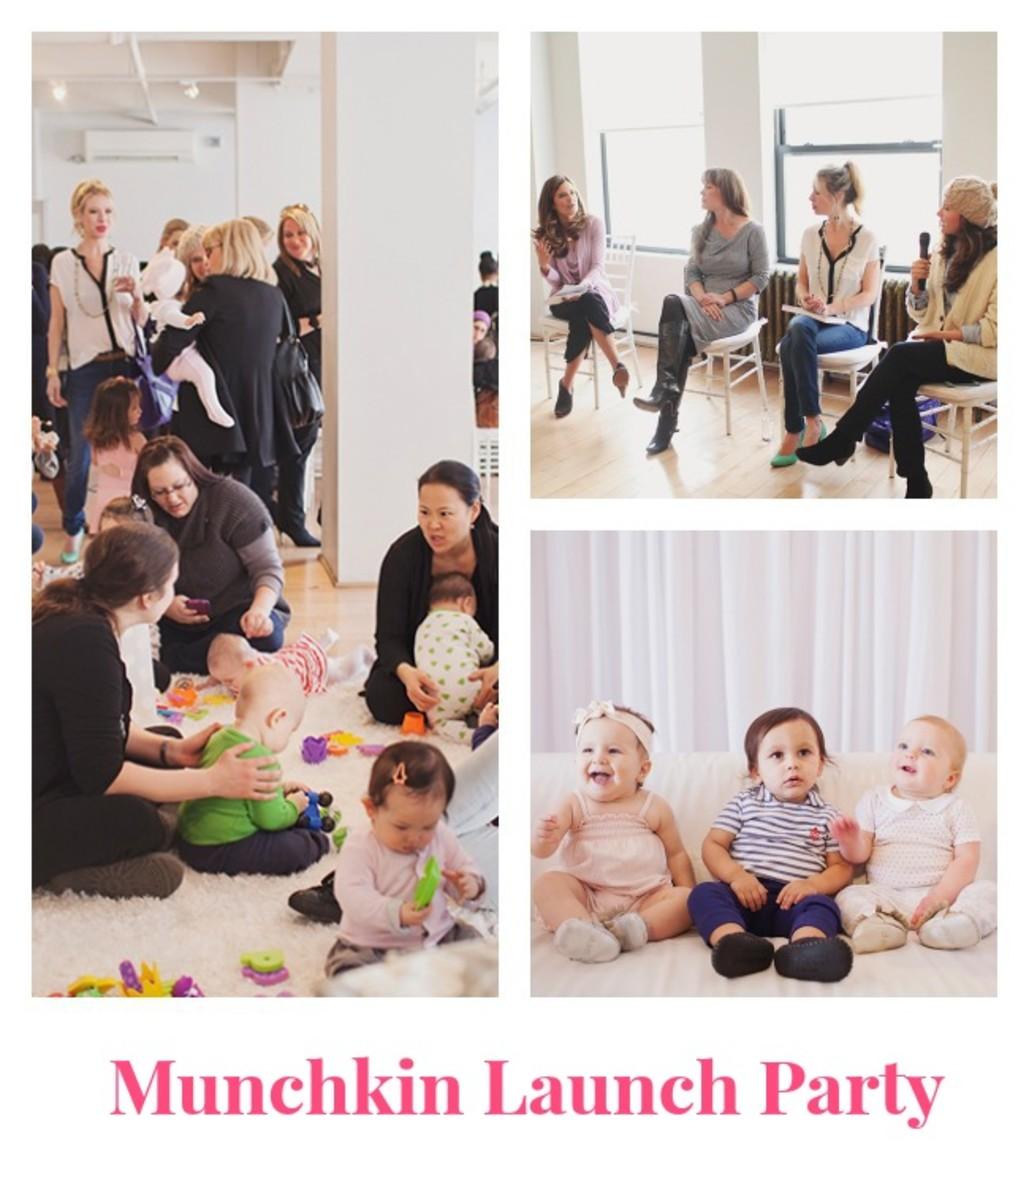 Munchkin Launch Party.jpg